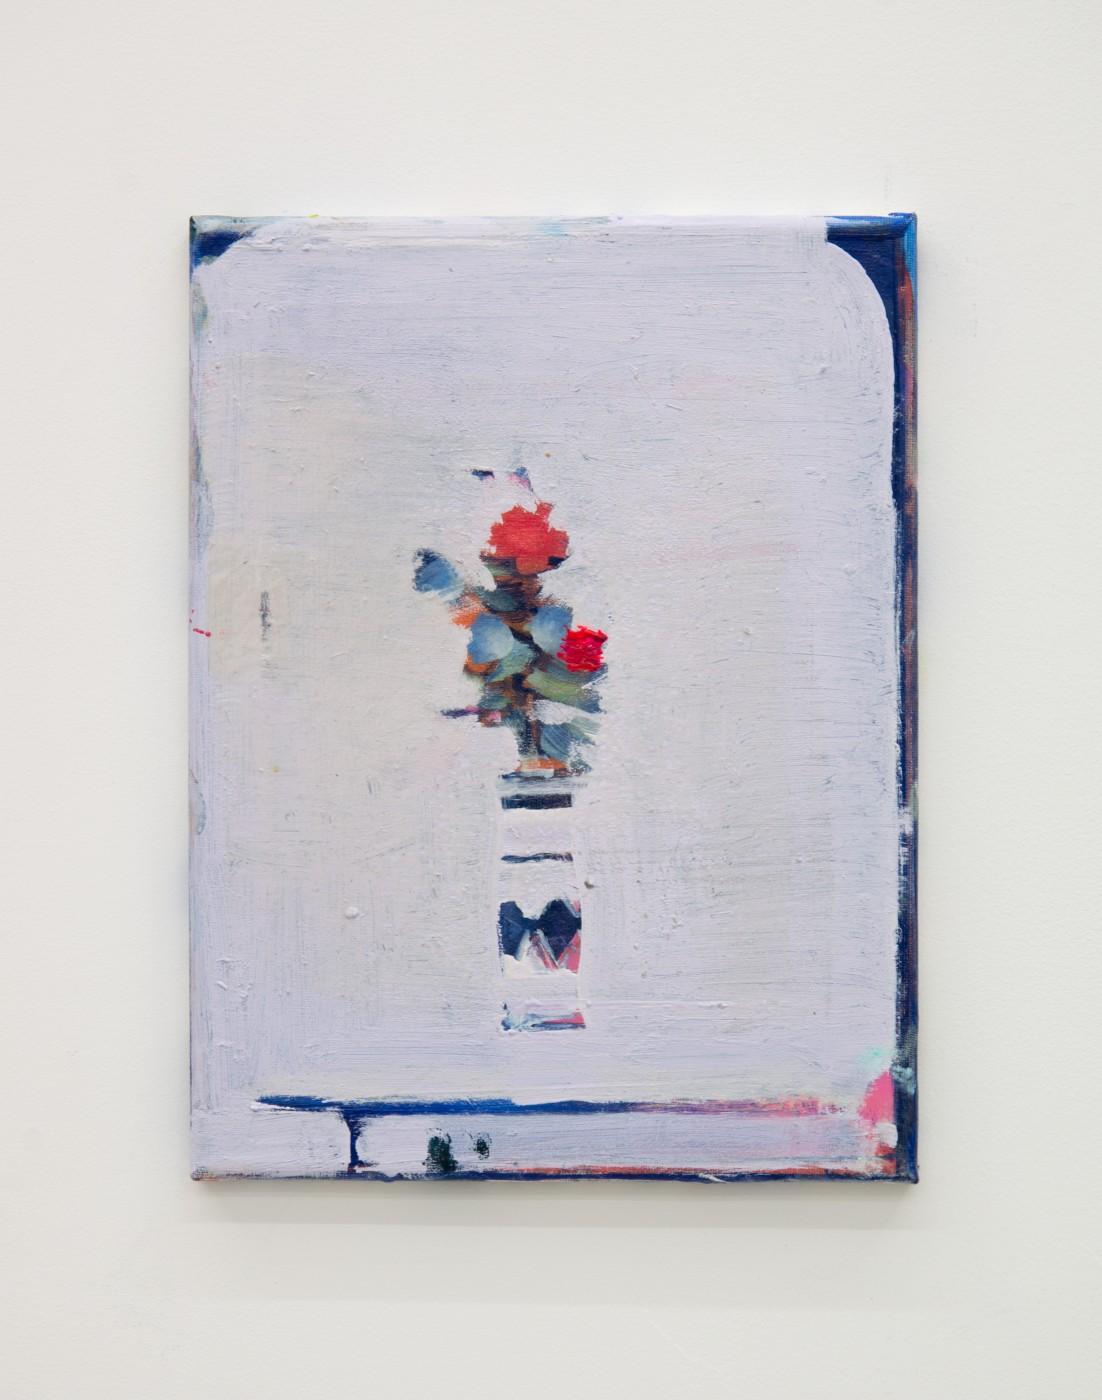 WALLFLOWERS, MALFLOWERS  Small flower 14 , 2018  Oil on canvas   35 x 27,5 cm / 14 x 11 in  Nathan Zeidman